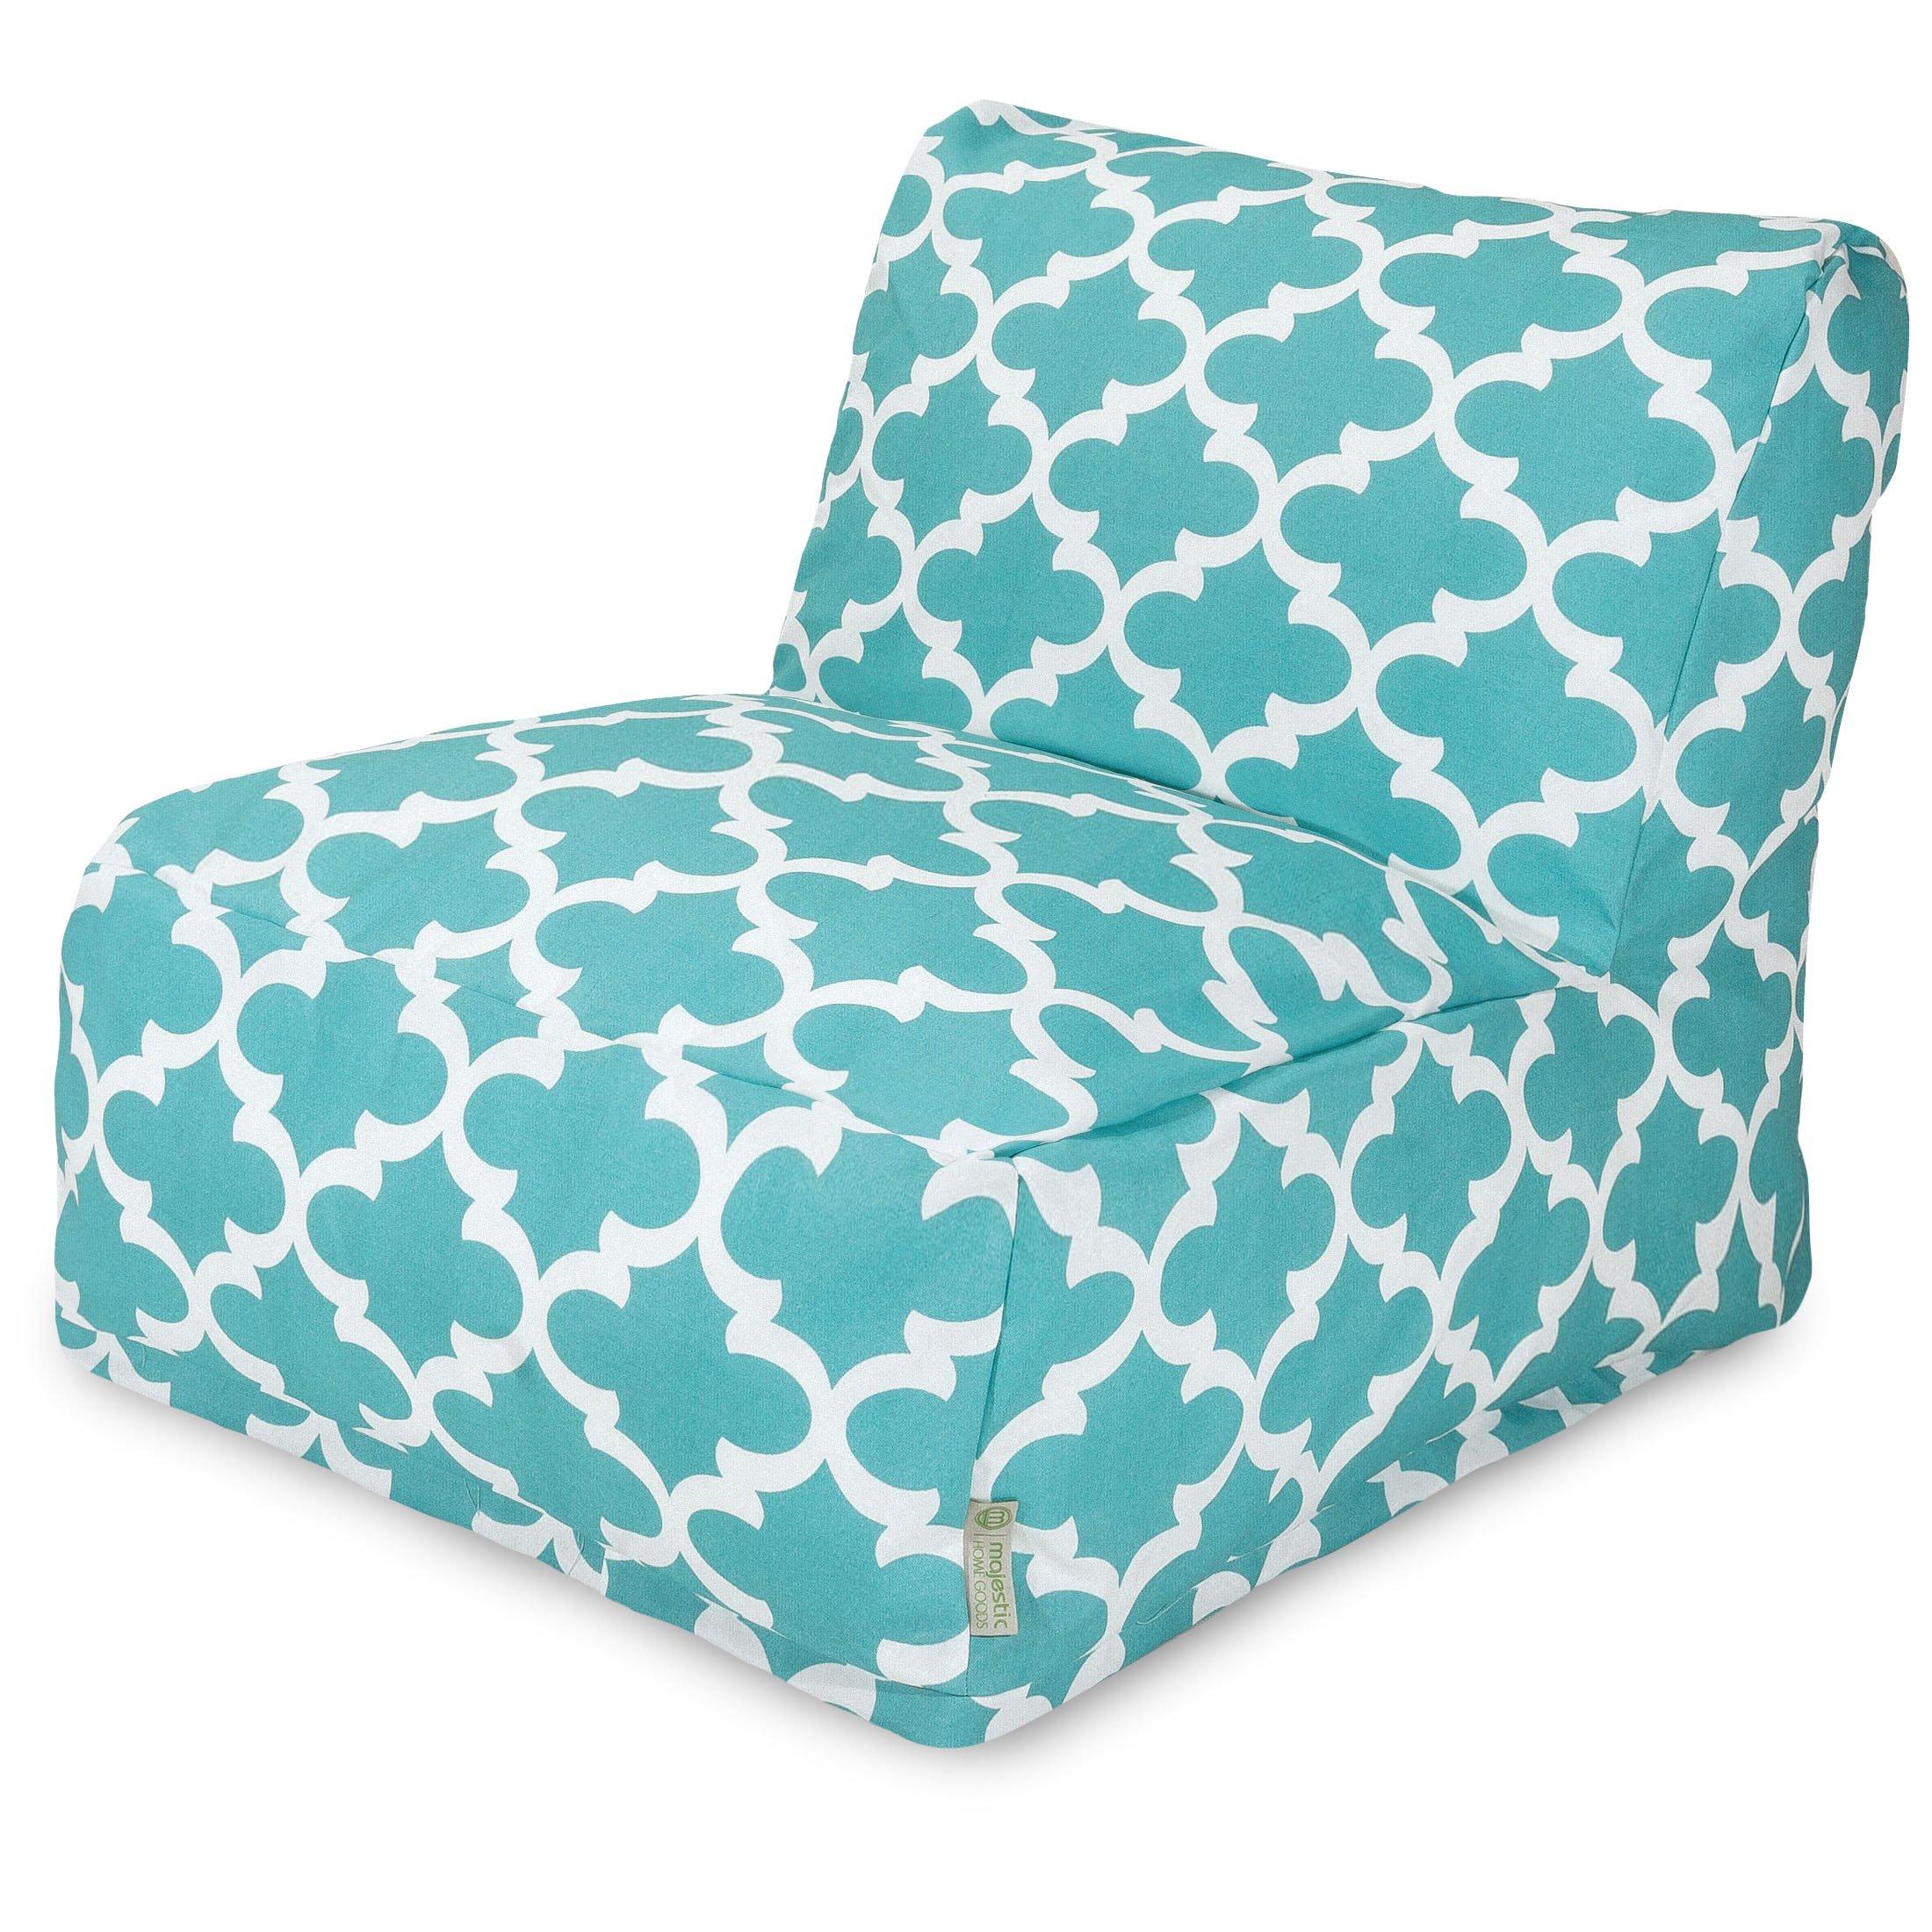 Majestic Home Goods Trellis Bean Bag Chair Lounger, Teal